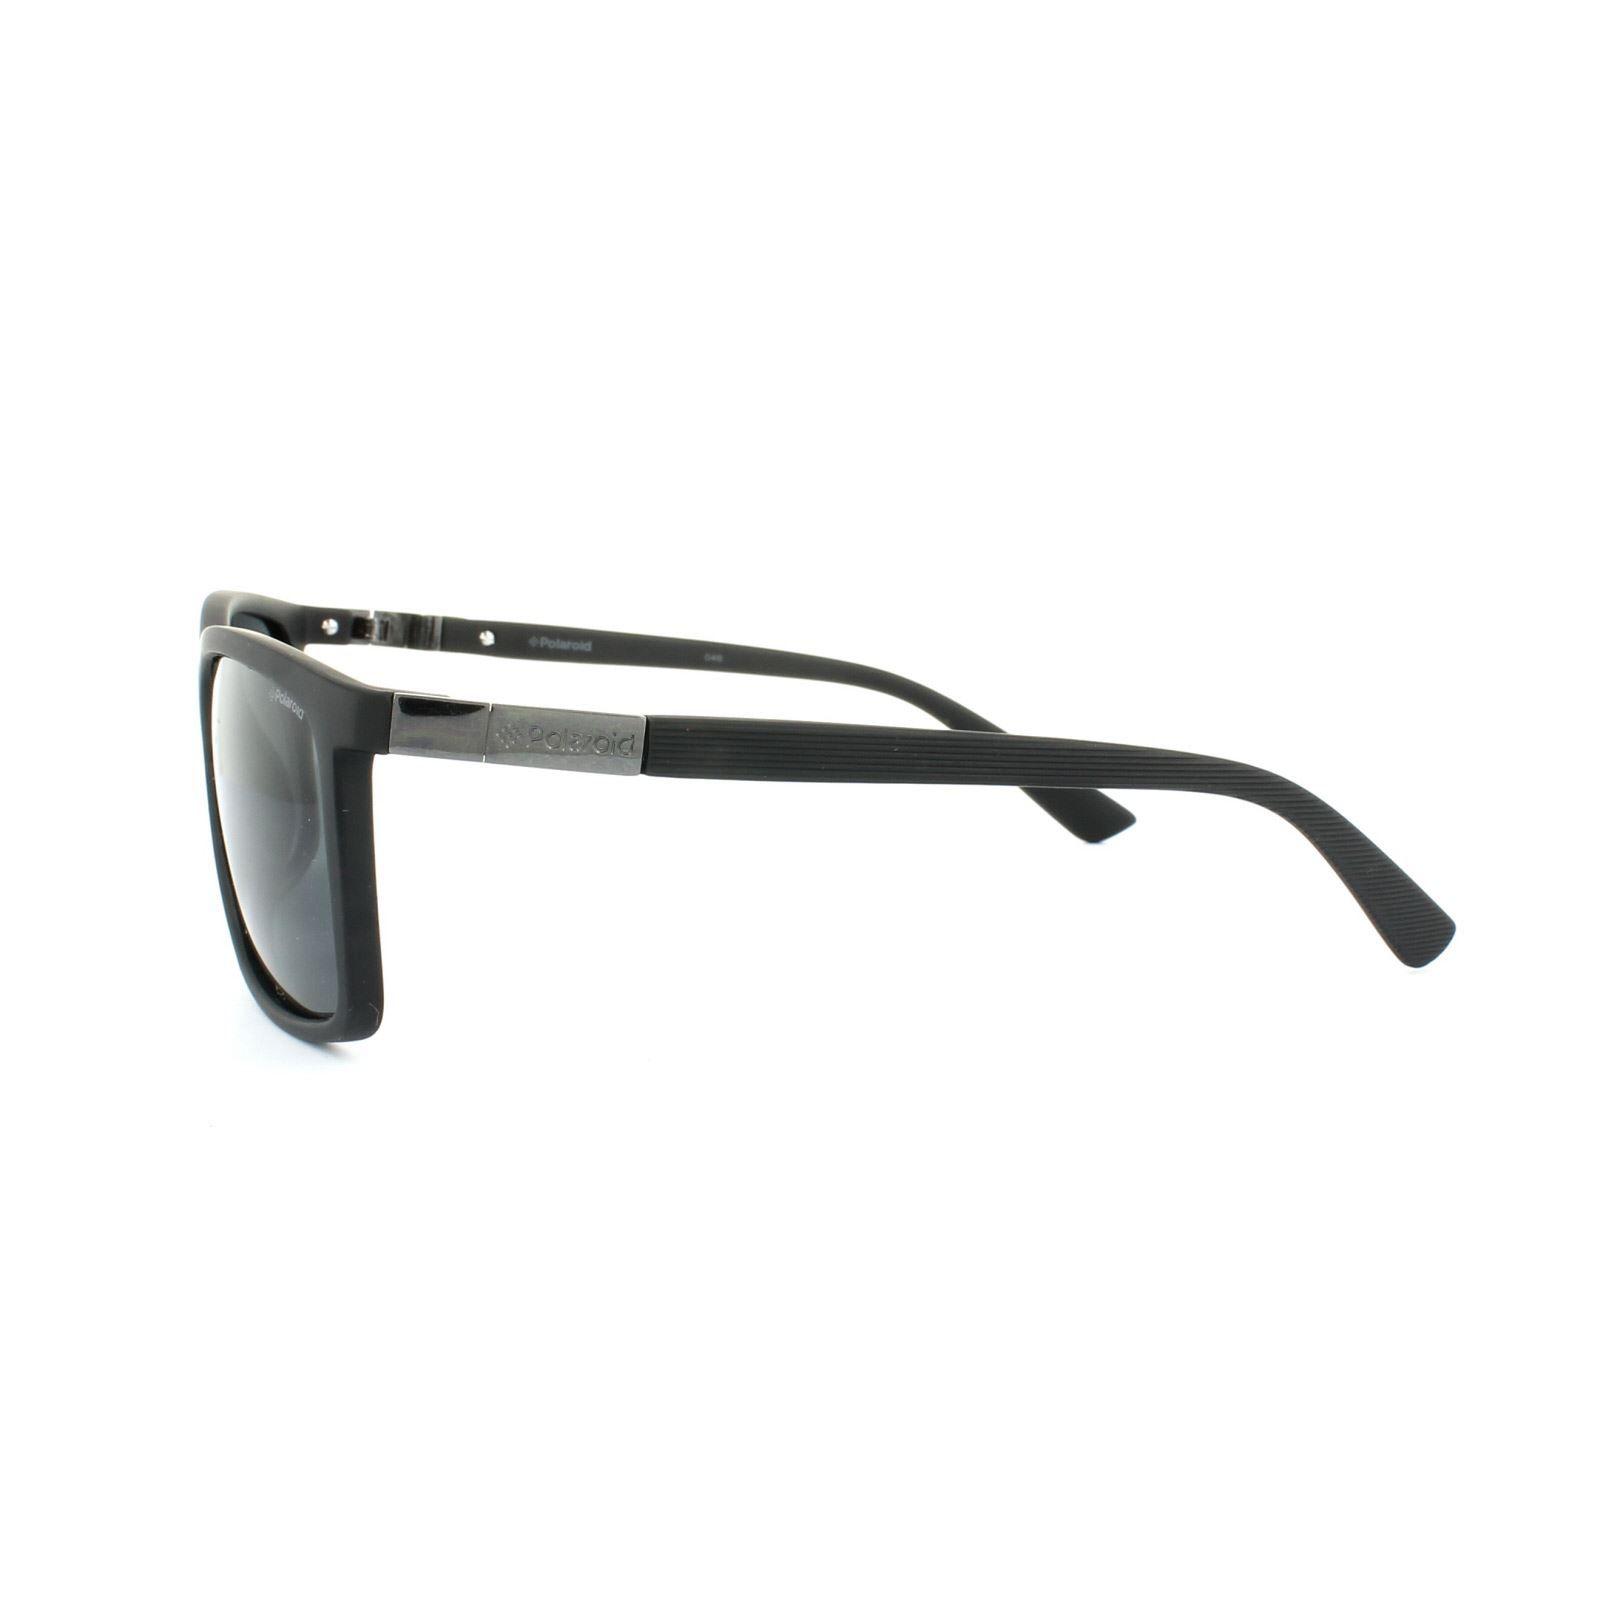 Polaroid Sunglasses P8346 KIH Y2 Black Grey Polarized